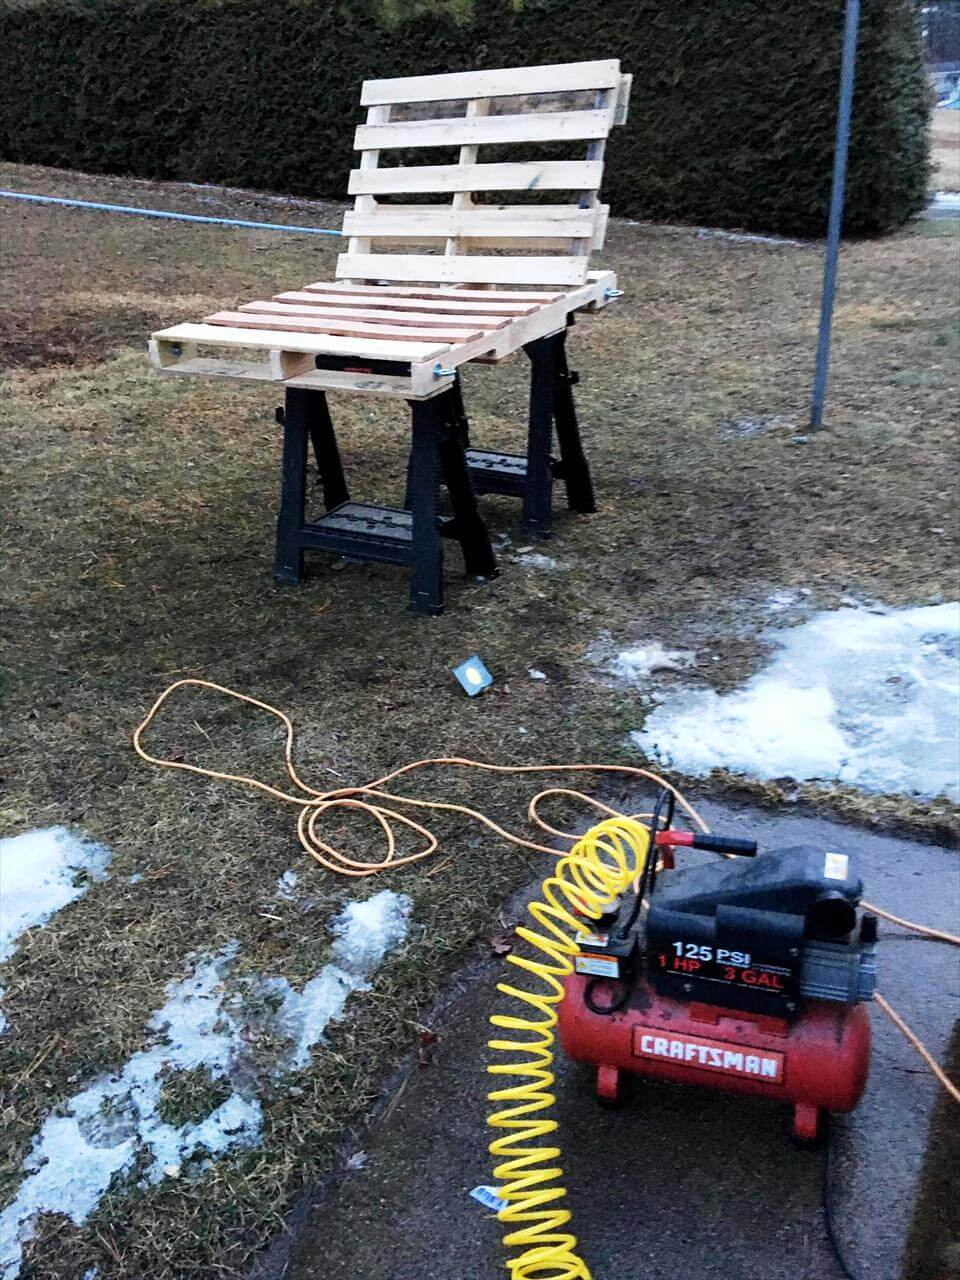 pallet-made L-shape swing seat